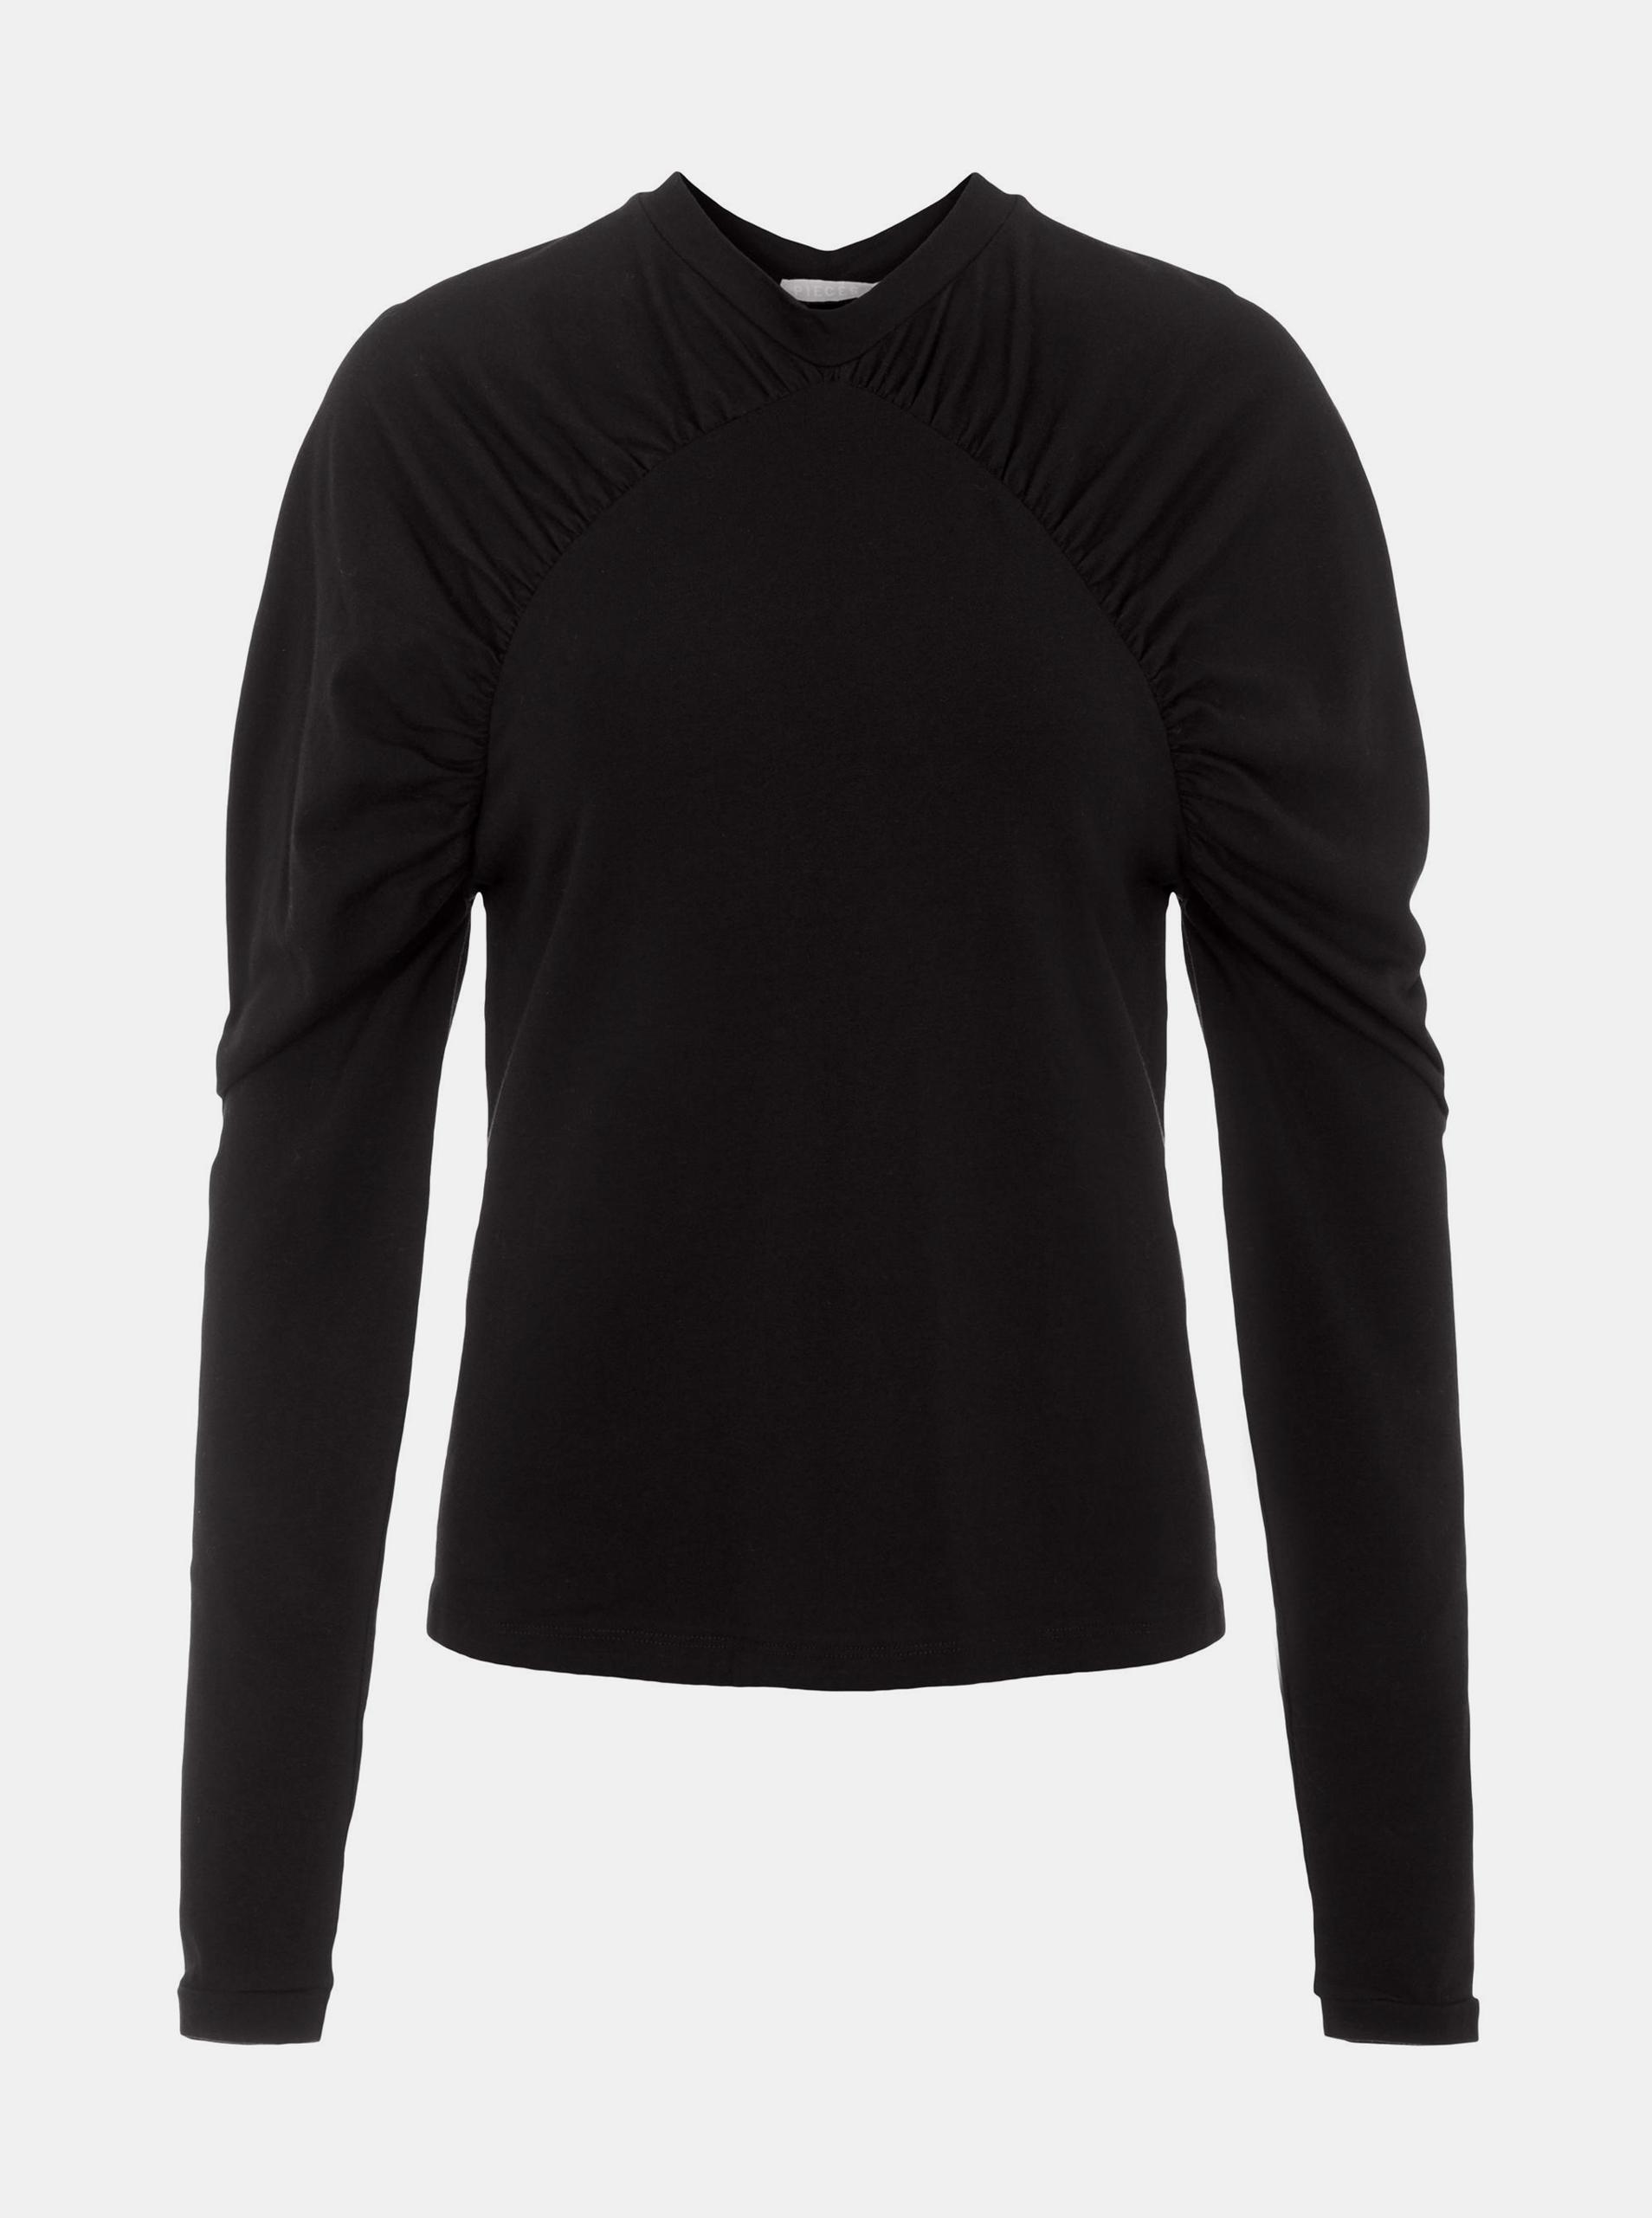 Pieces czarna koszulka damska